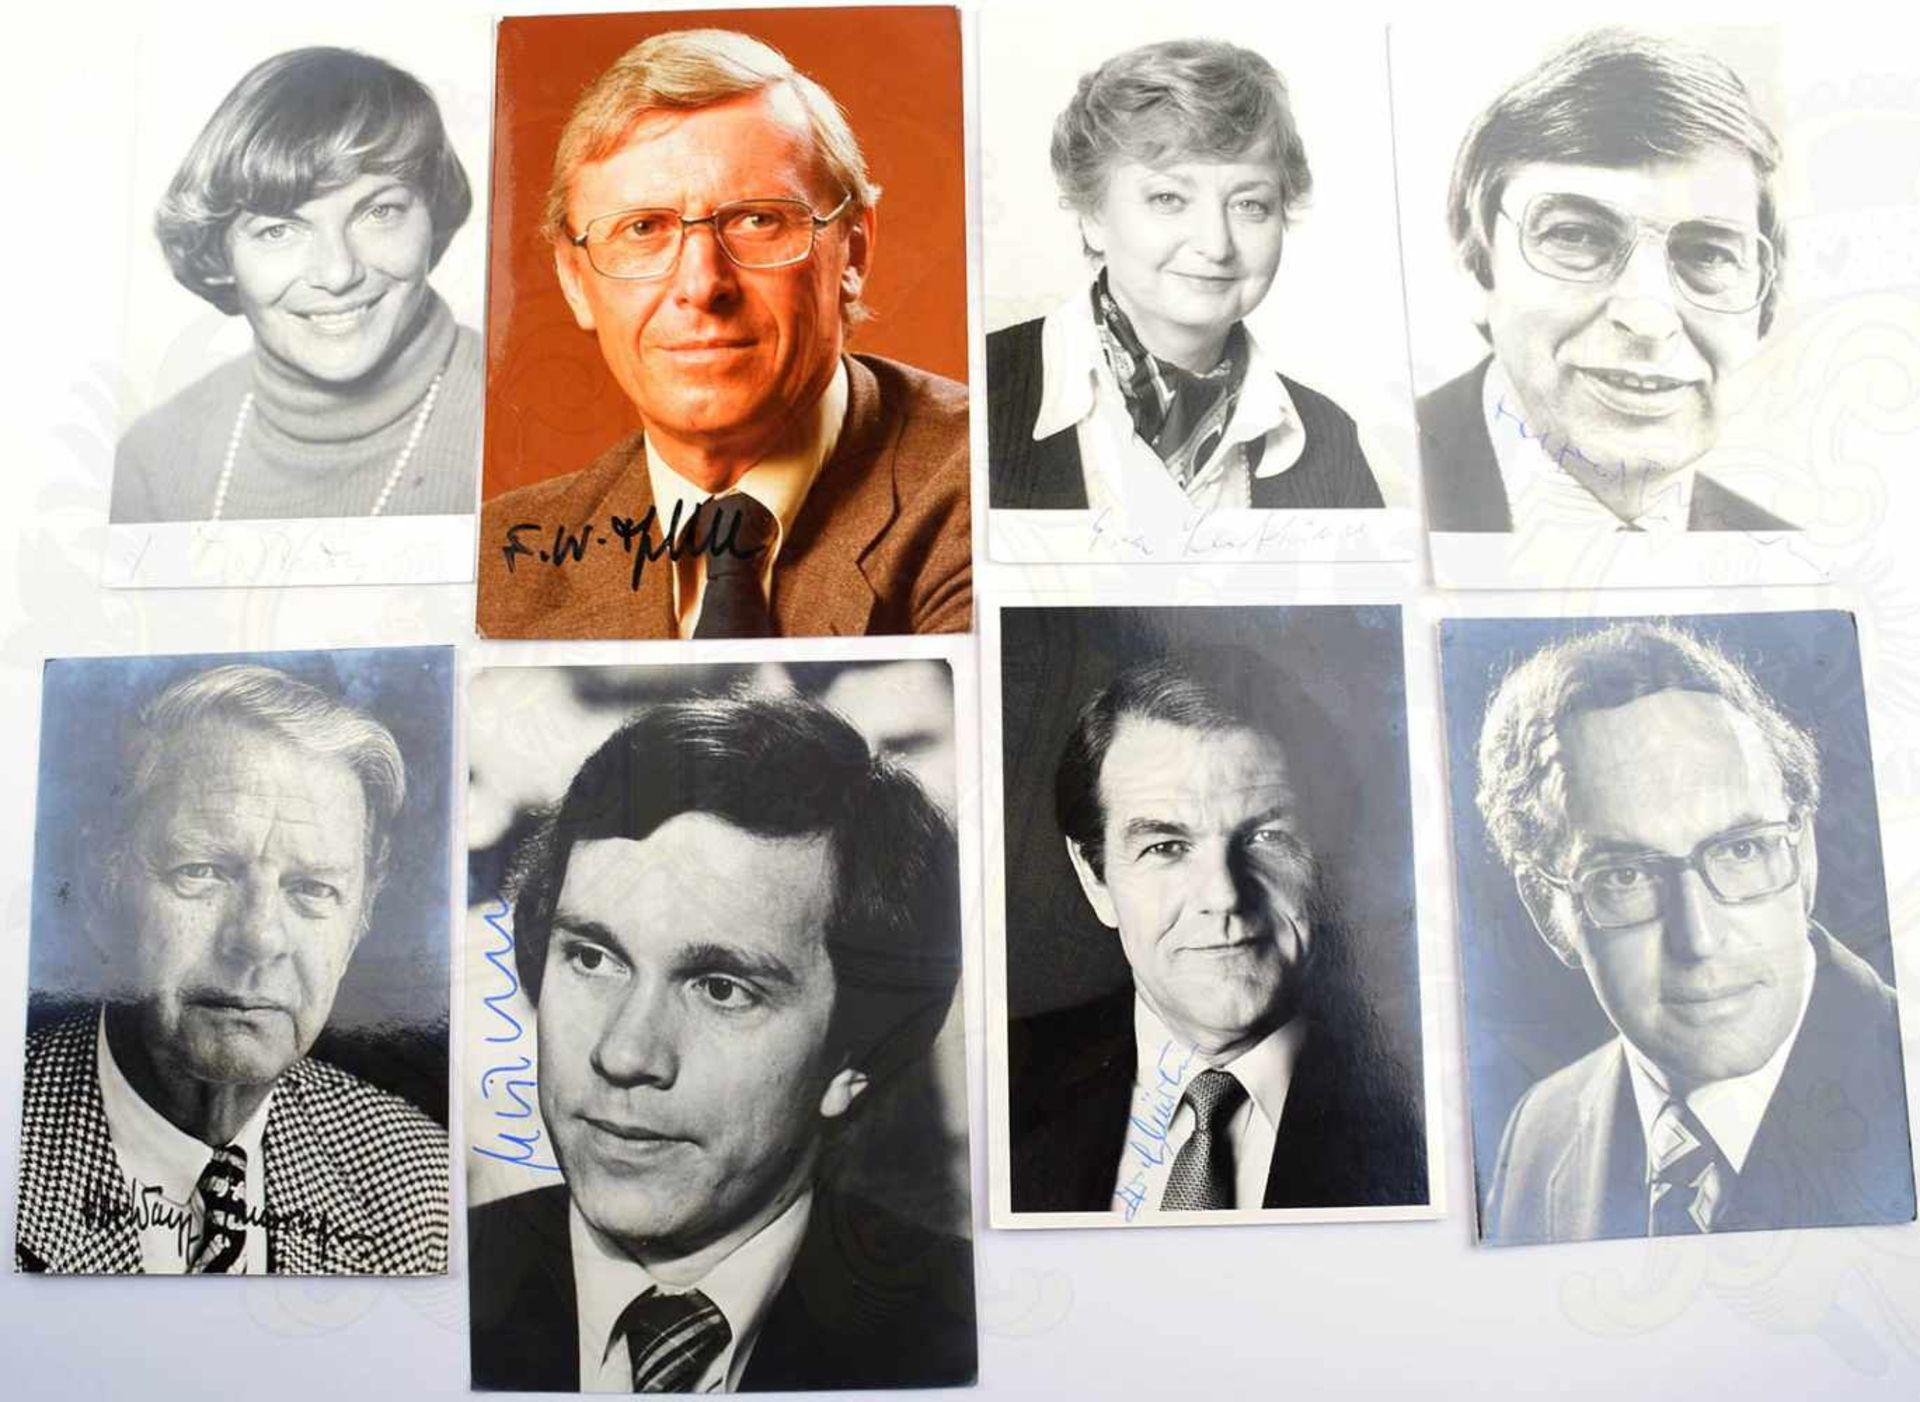 100 AUTOGRAMMKARTEN DEUTSCHE POLITIK 1979-1987, Bundesminister, Staatsminister Parlamentarische - Bild 2 aus 3